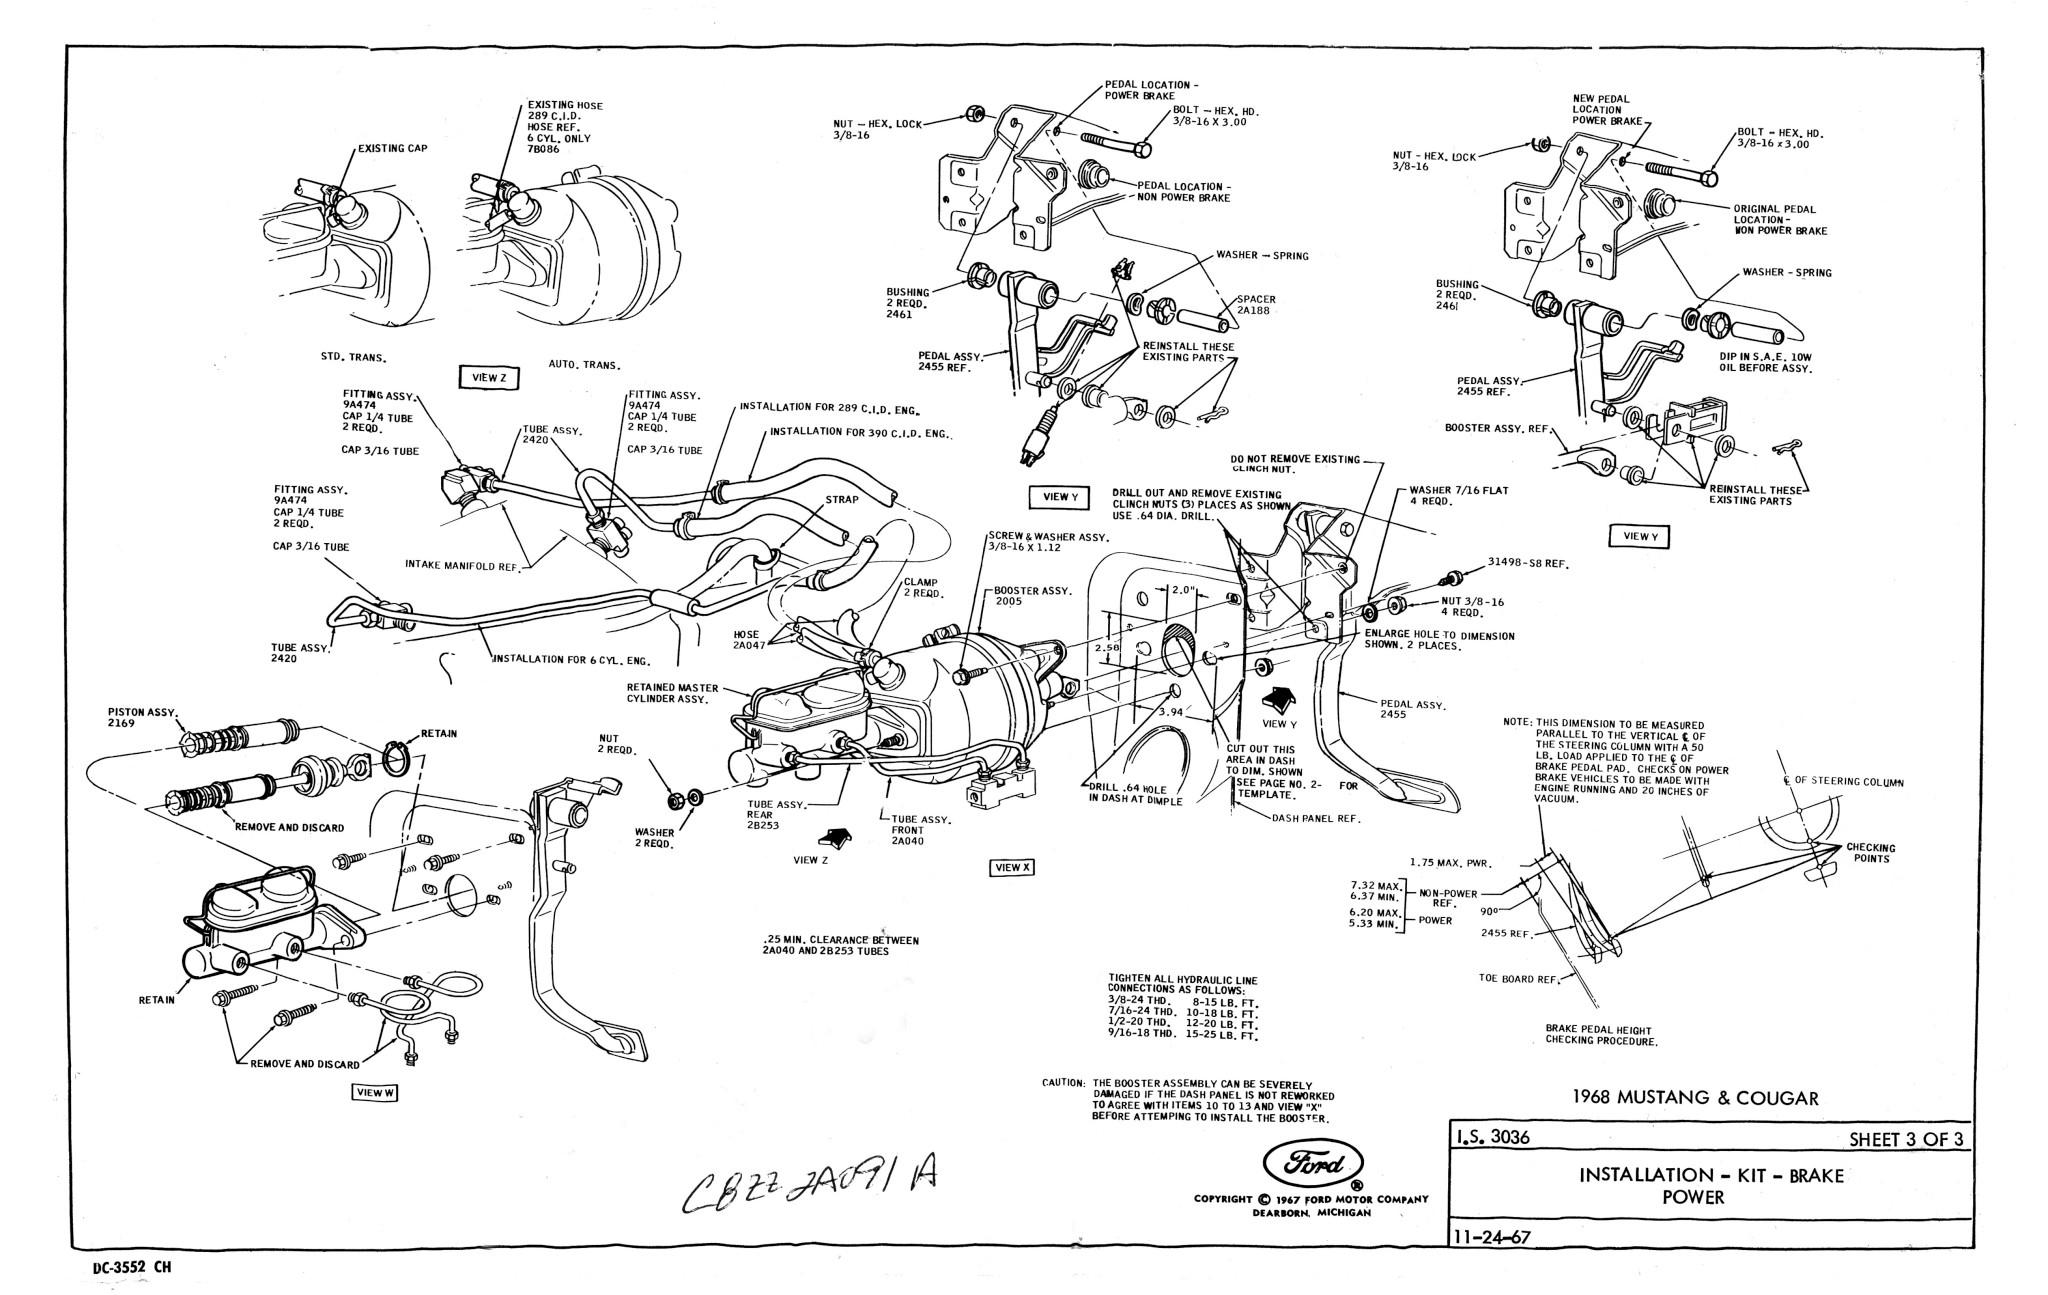 drum brake conversion - power - nos